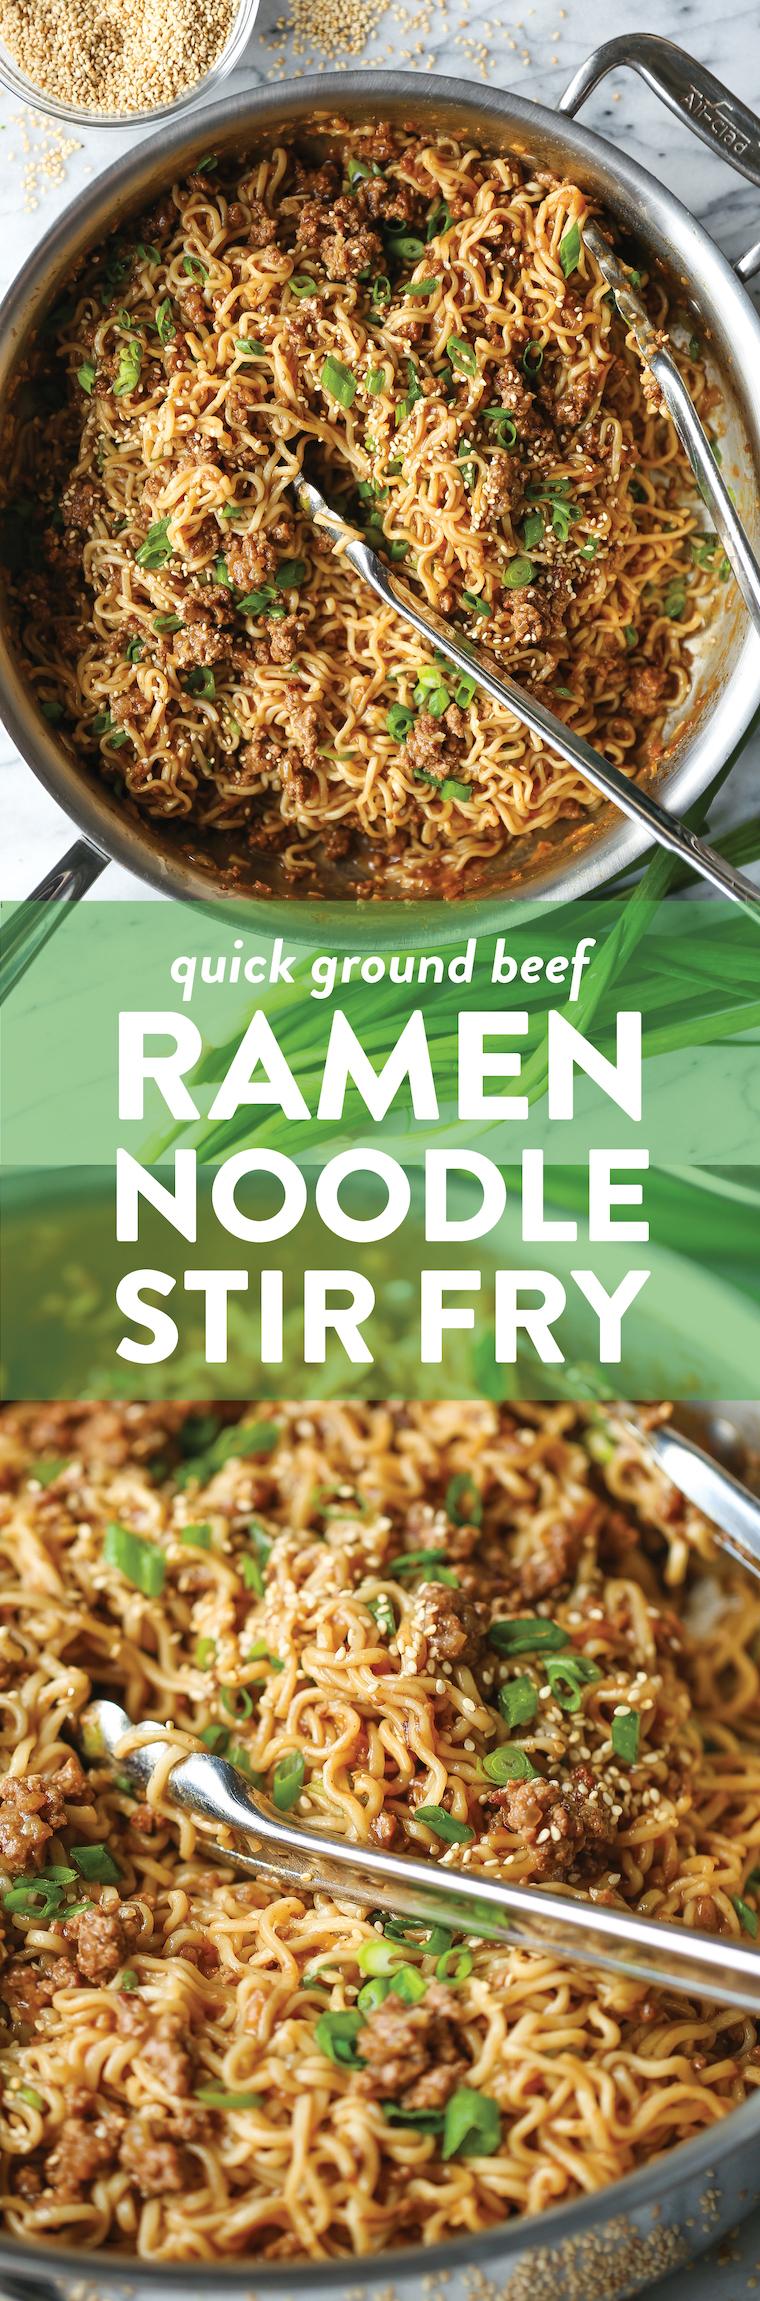 Quick Ramen Noodle Stir Fry Recipe